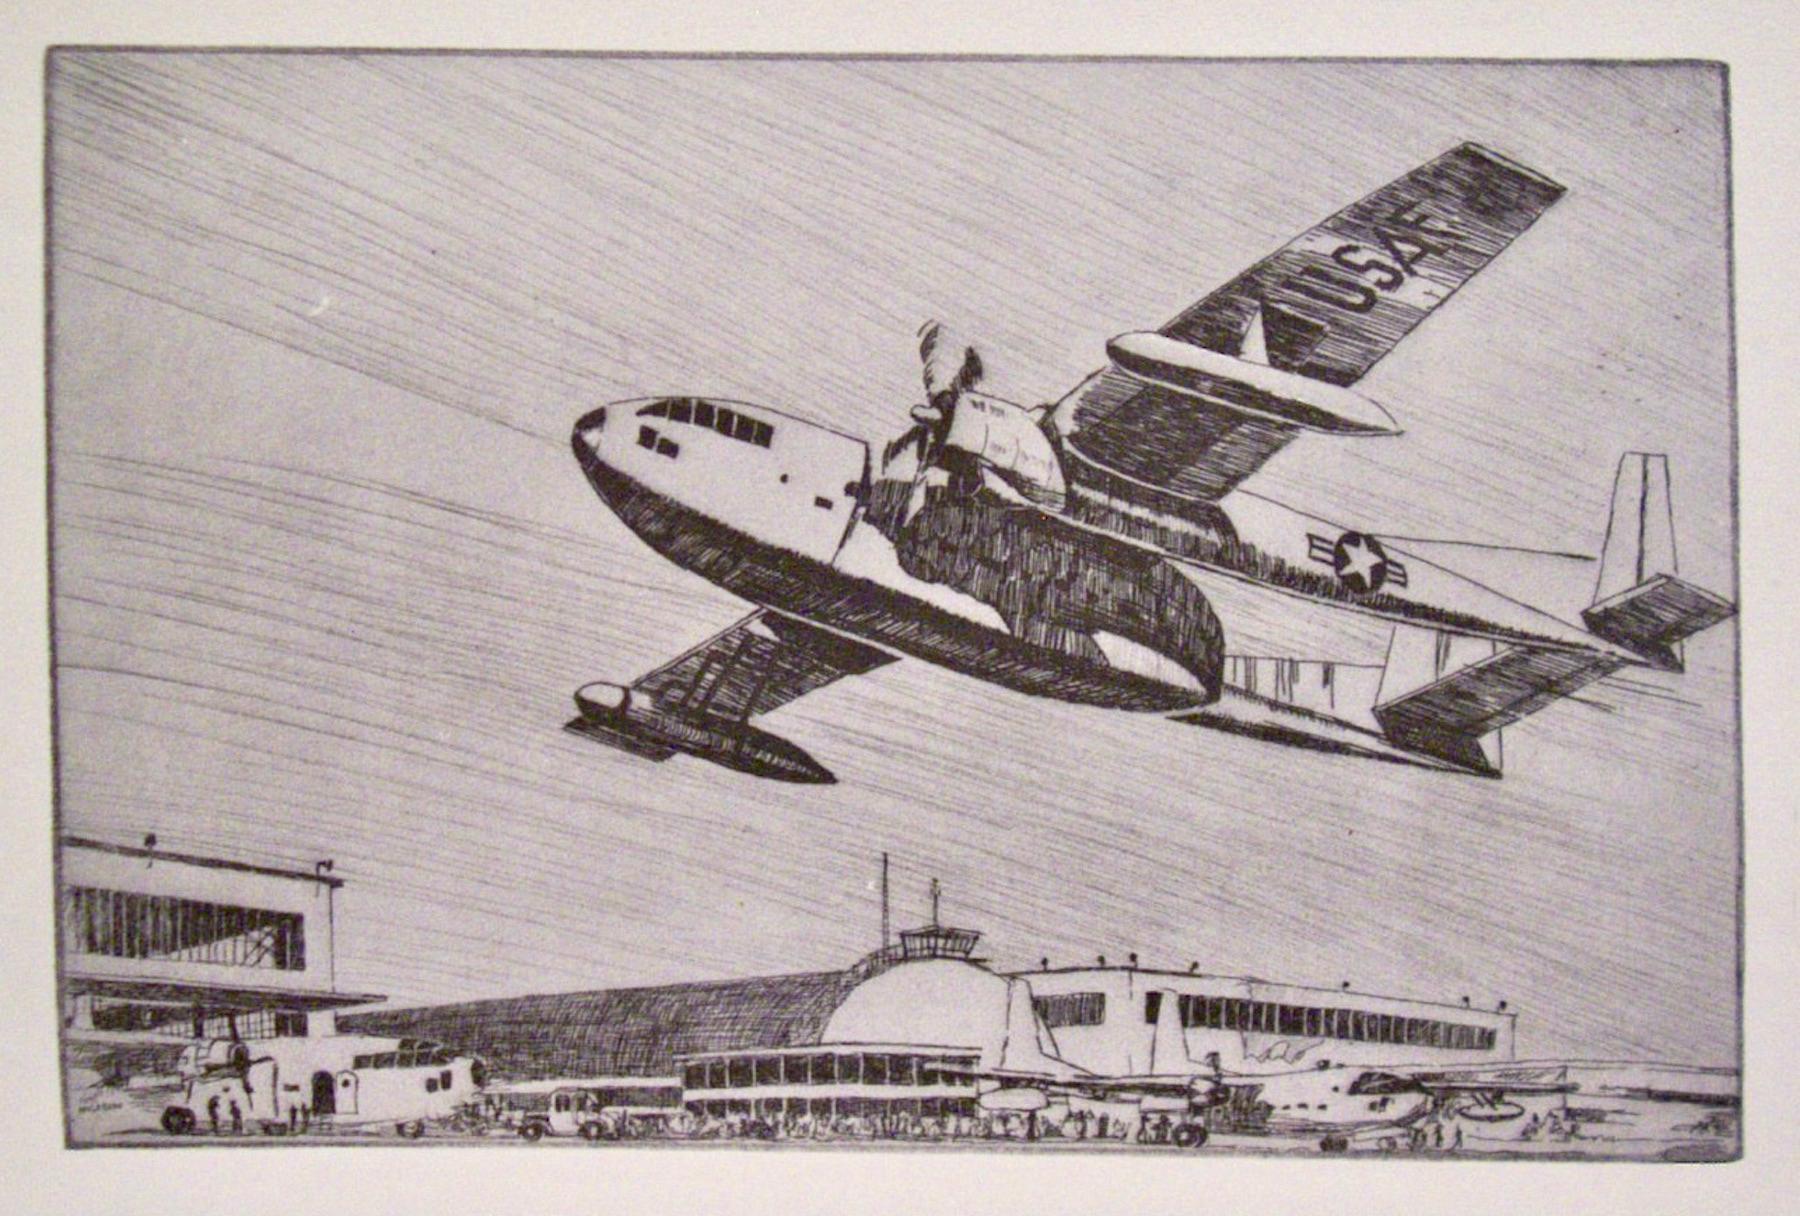 (US Air Force Fairchild C-119, the 'Flying Boxcar'